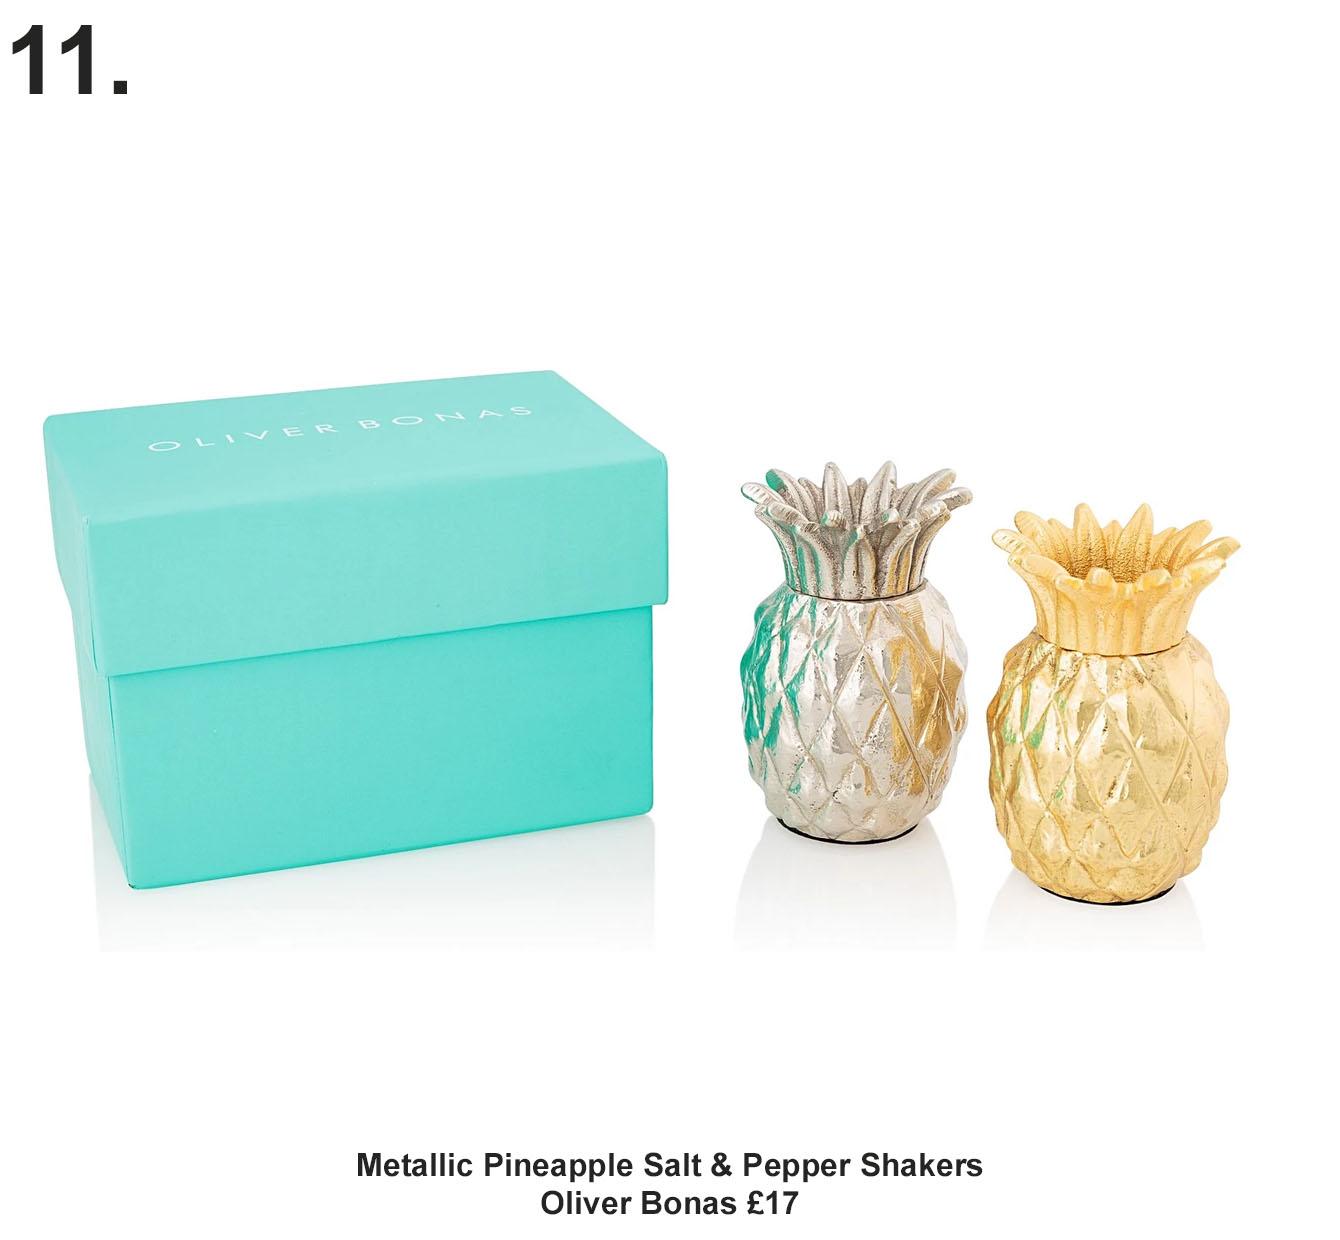 Metallic Pineapple Salt & Pepper Shakers, Oliver Bonas £17